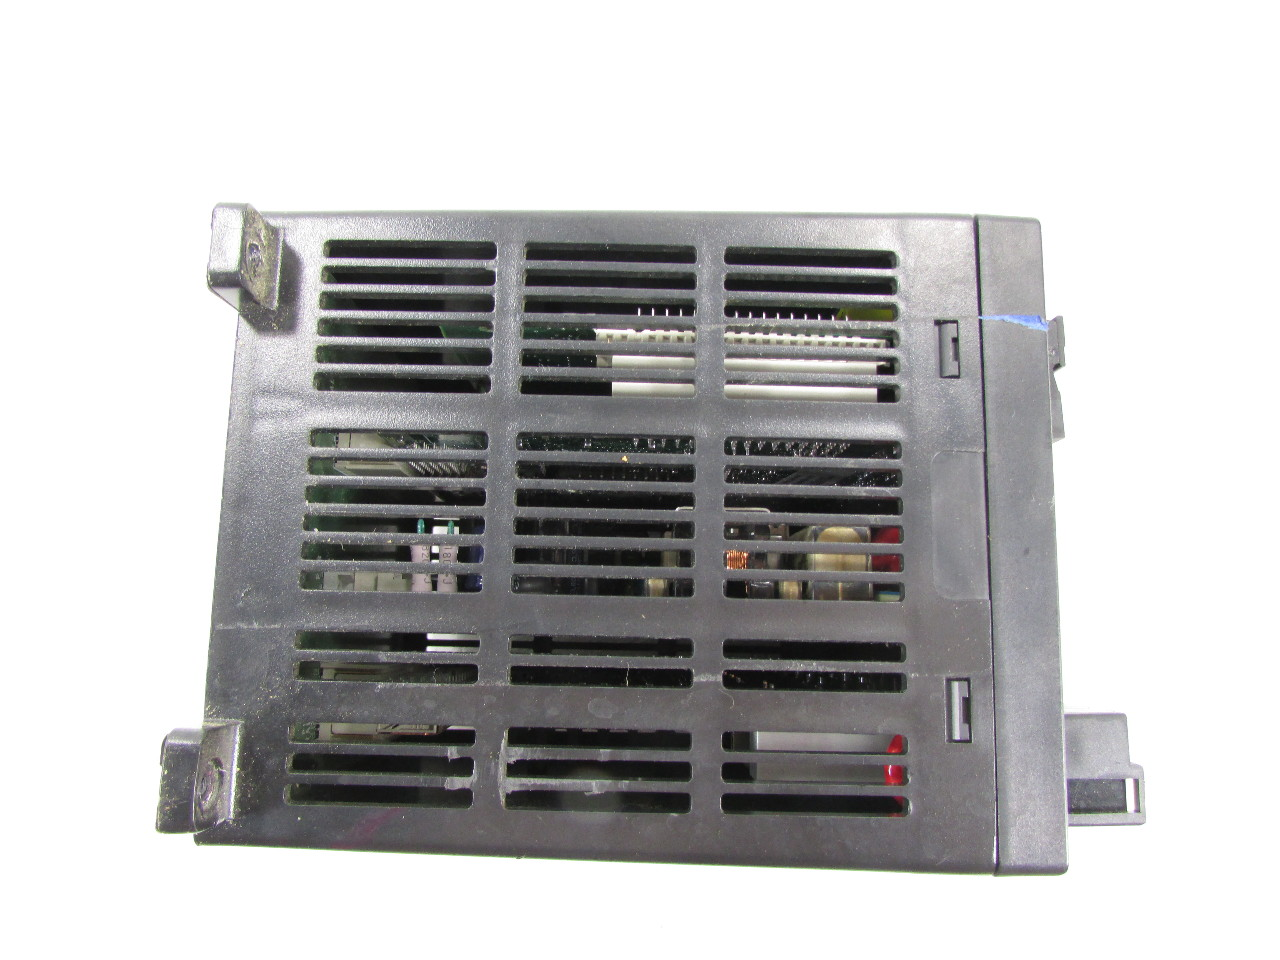 Allen Bradley Power Monitor 1000 : Allen bradley m a rio powermonitor ebay